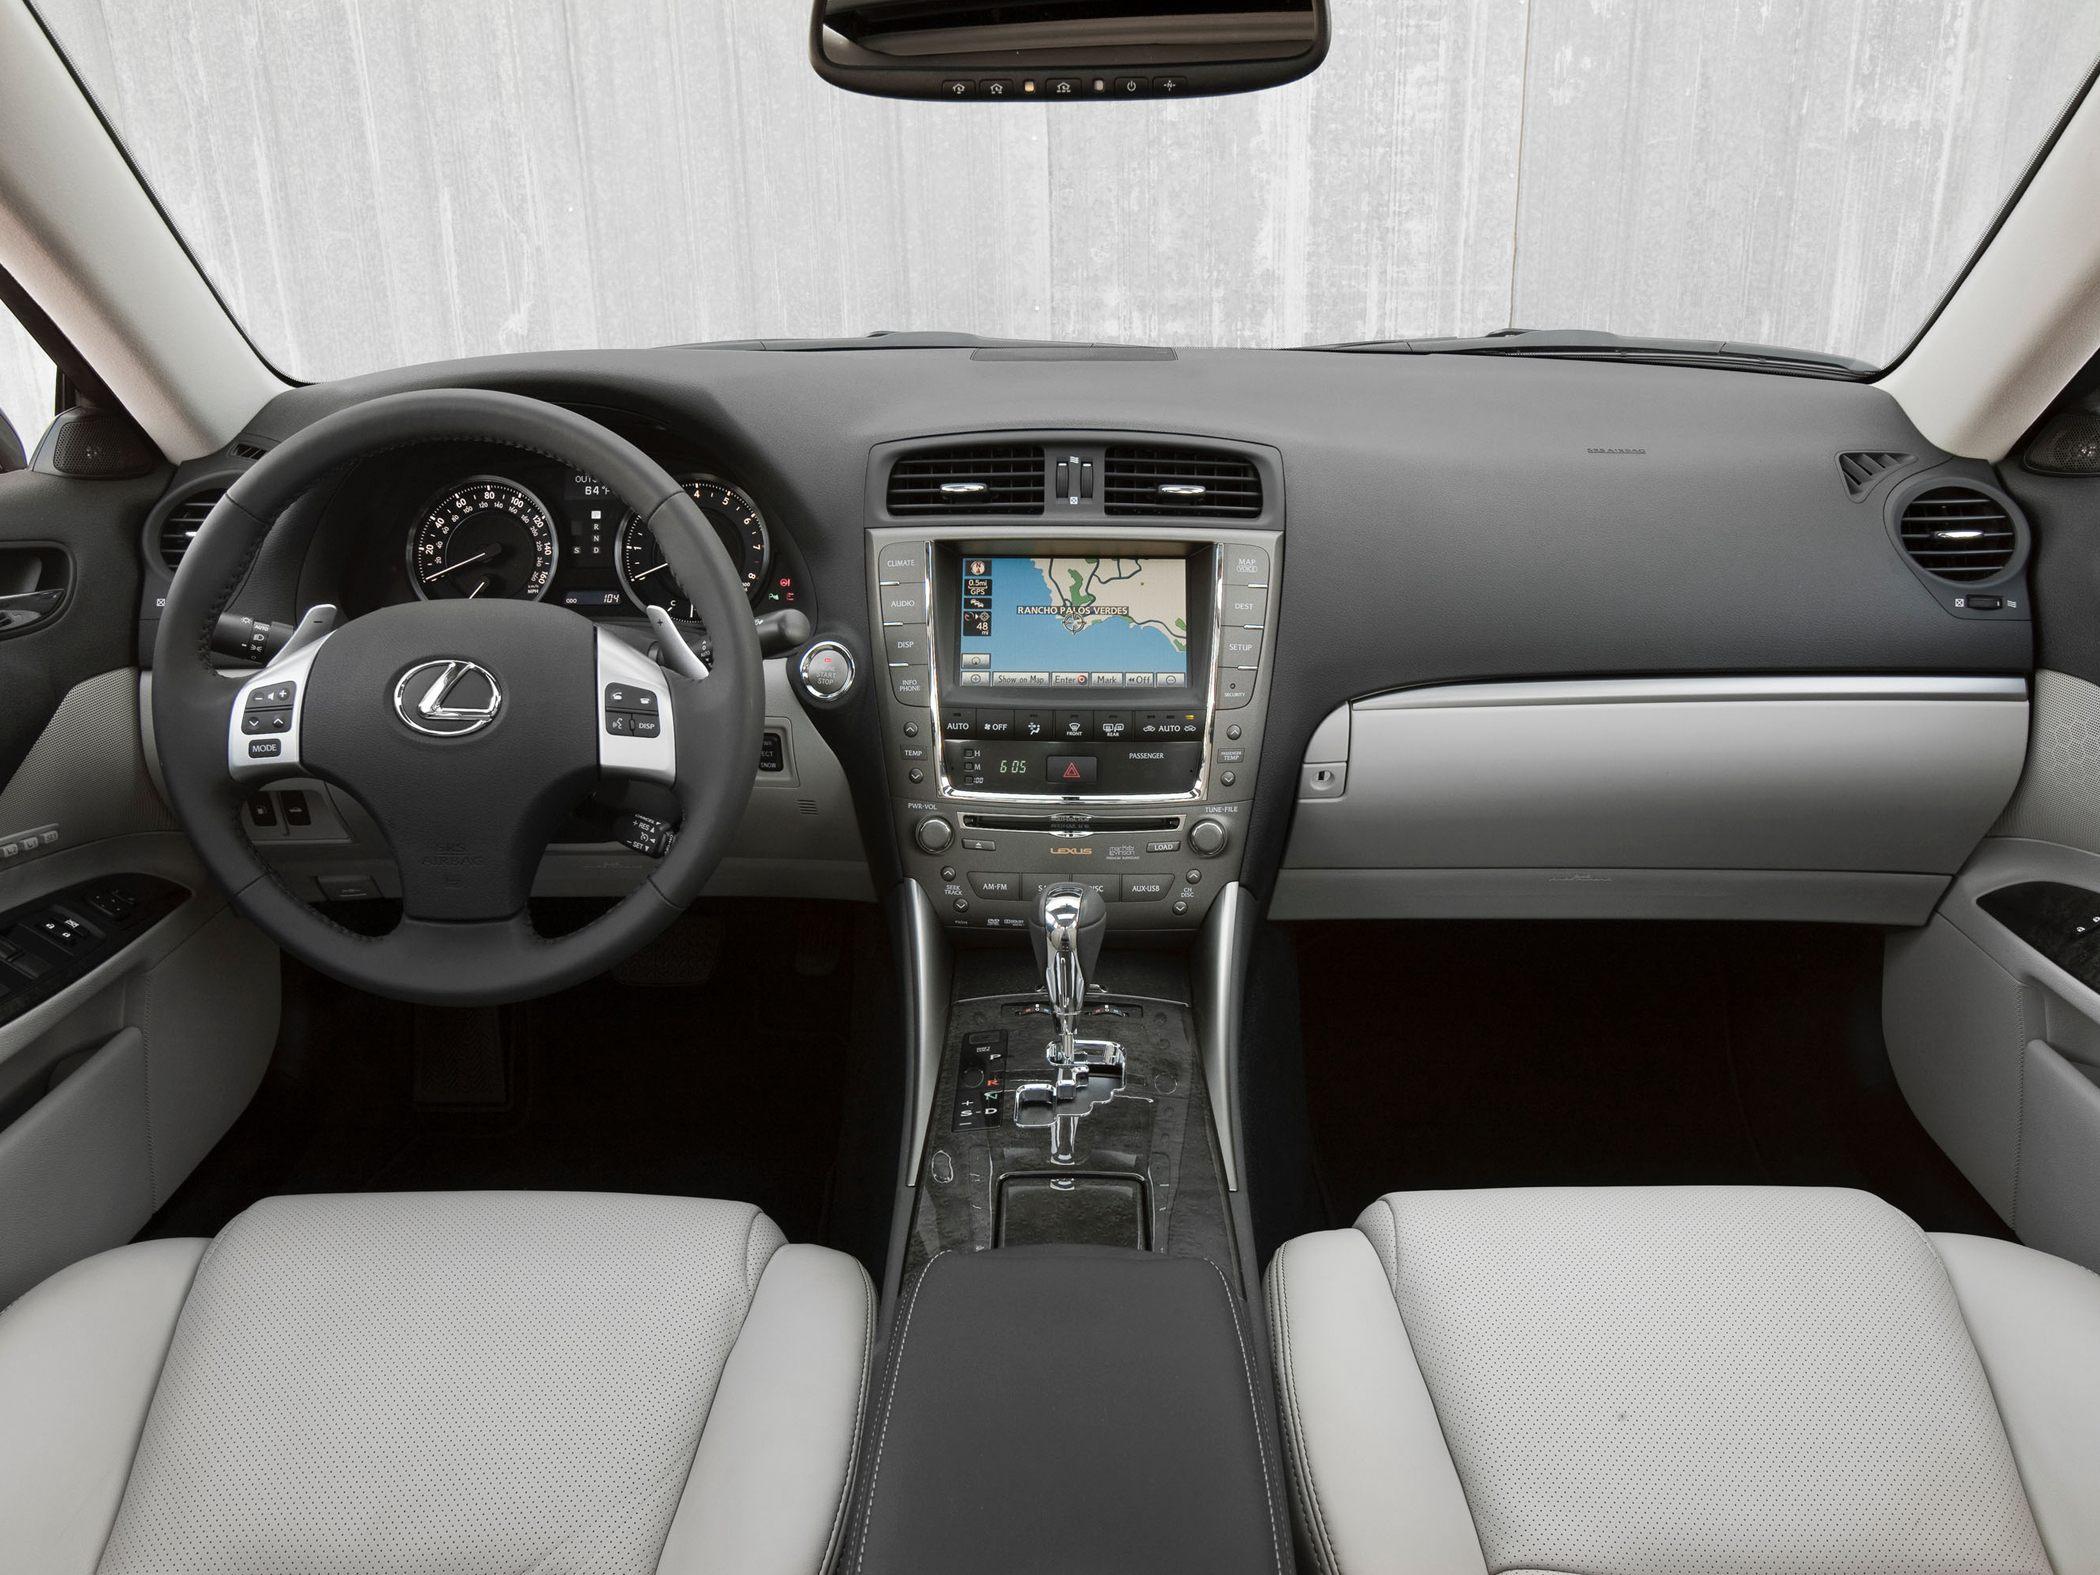 lexus magazine editors headlight is rwd sedan news automobile awd notebook